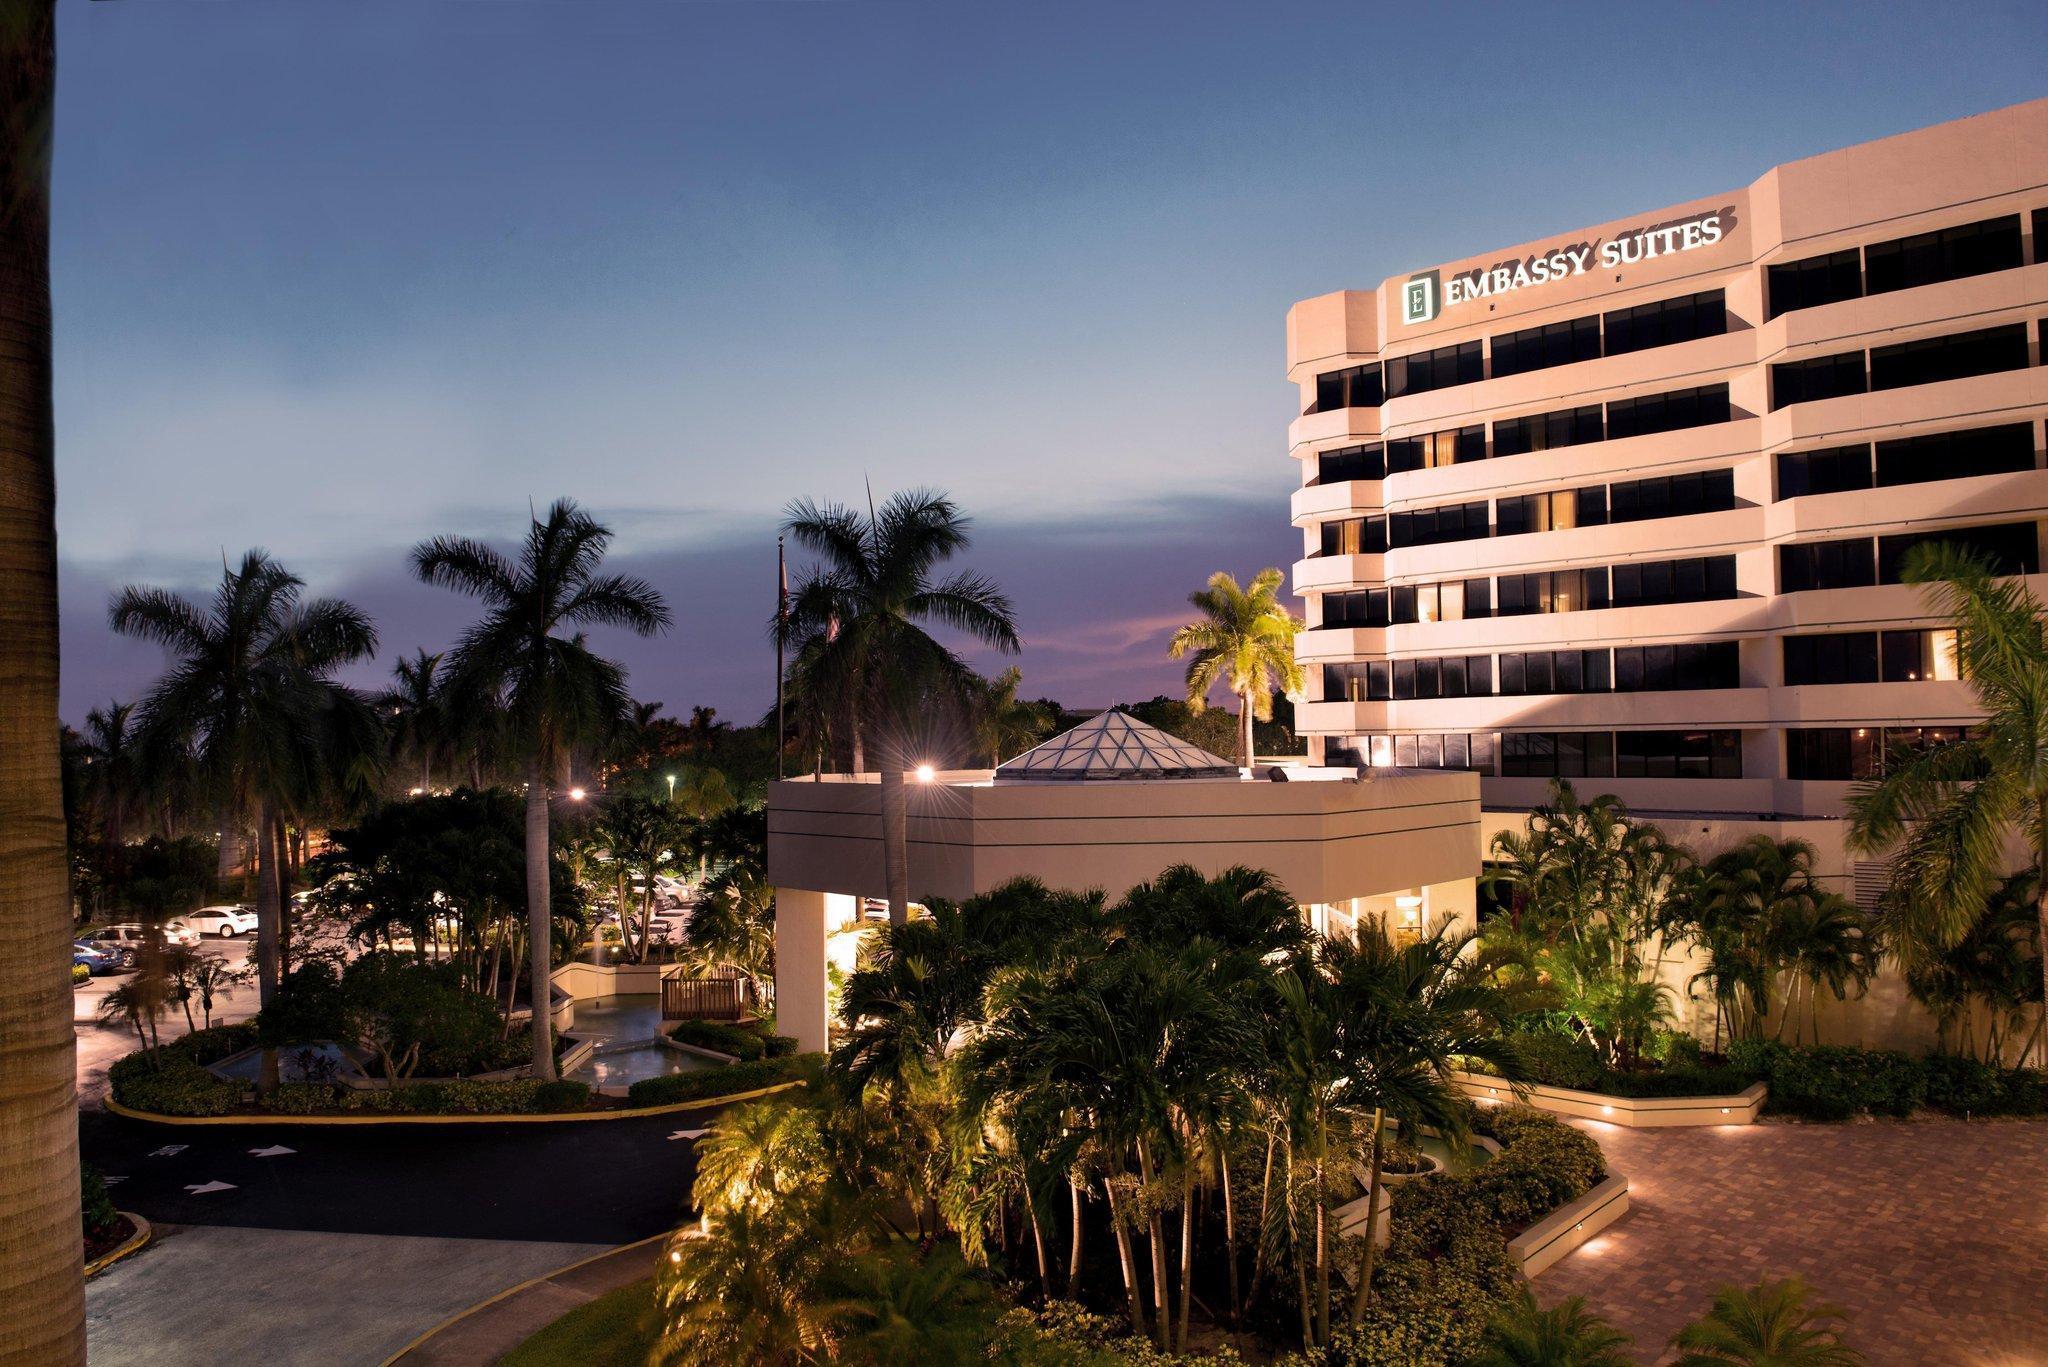 Embassy Suites Boca Raton image